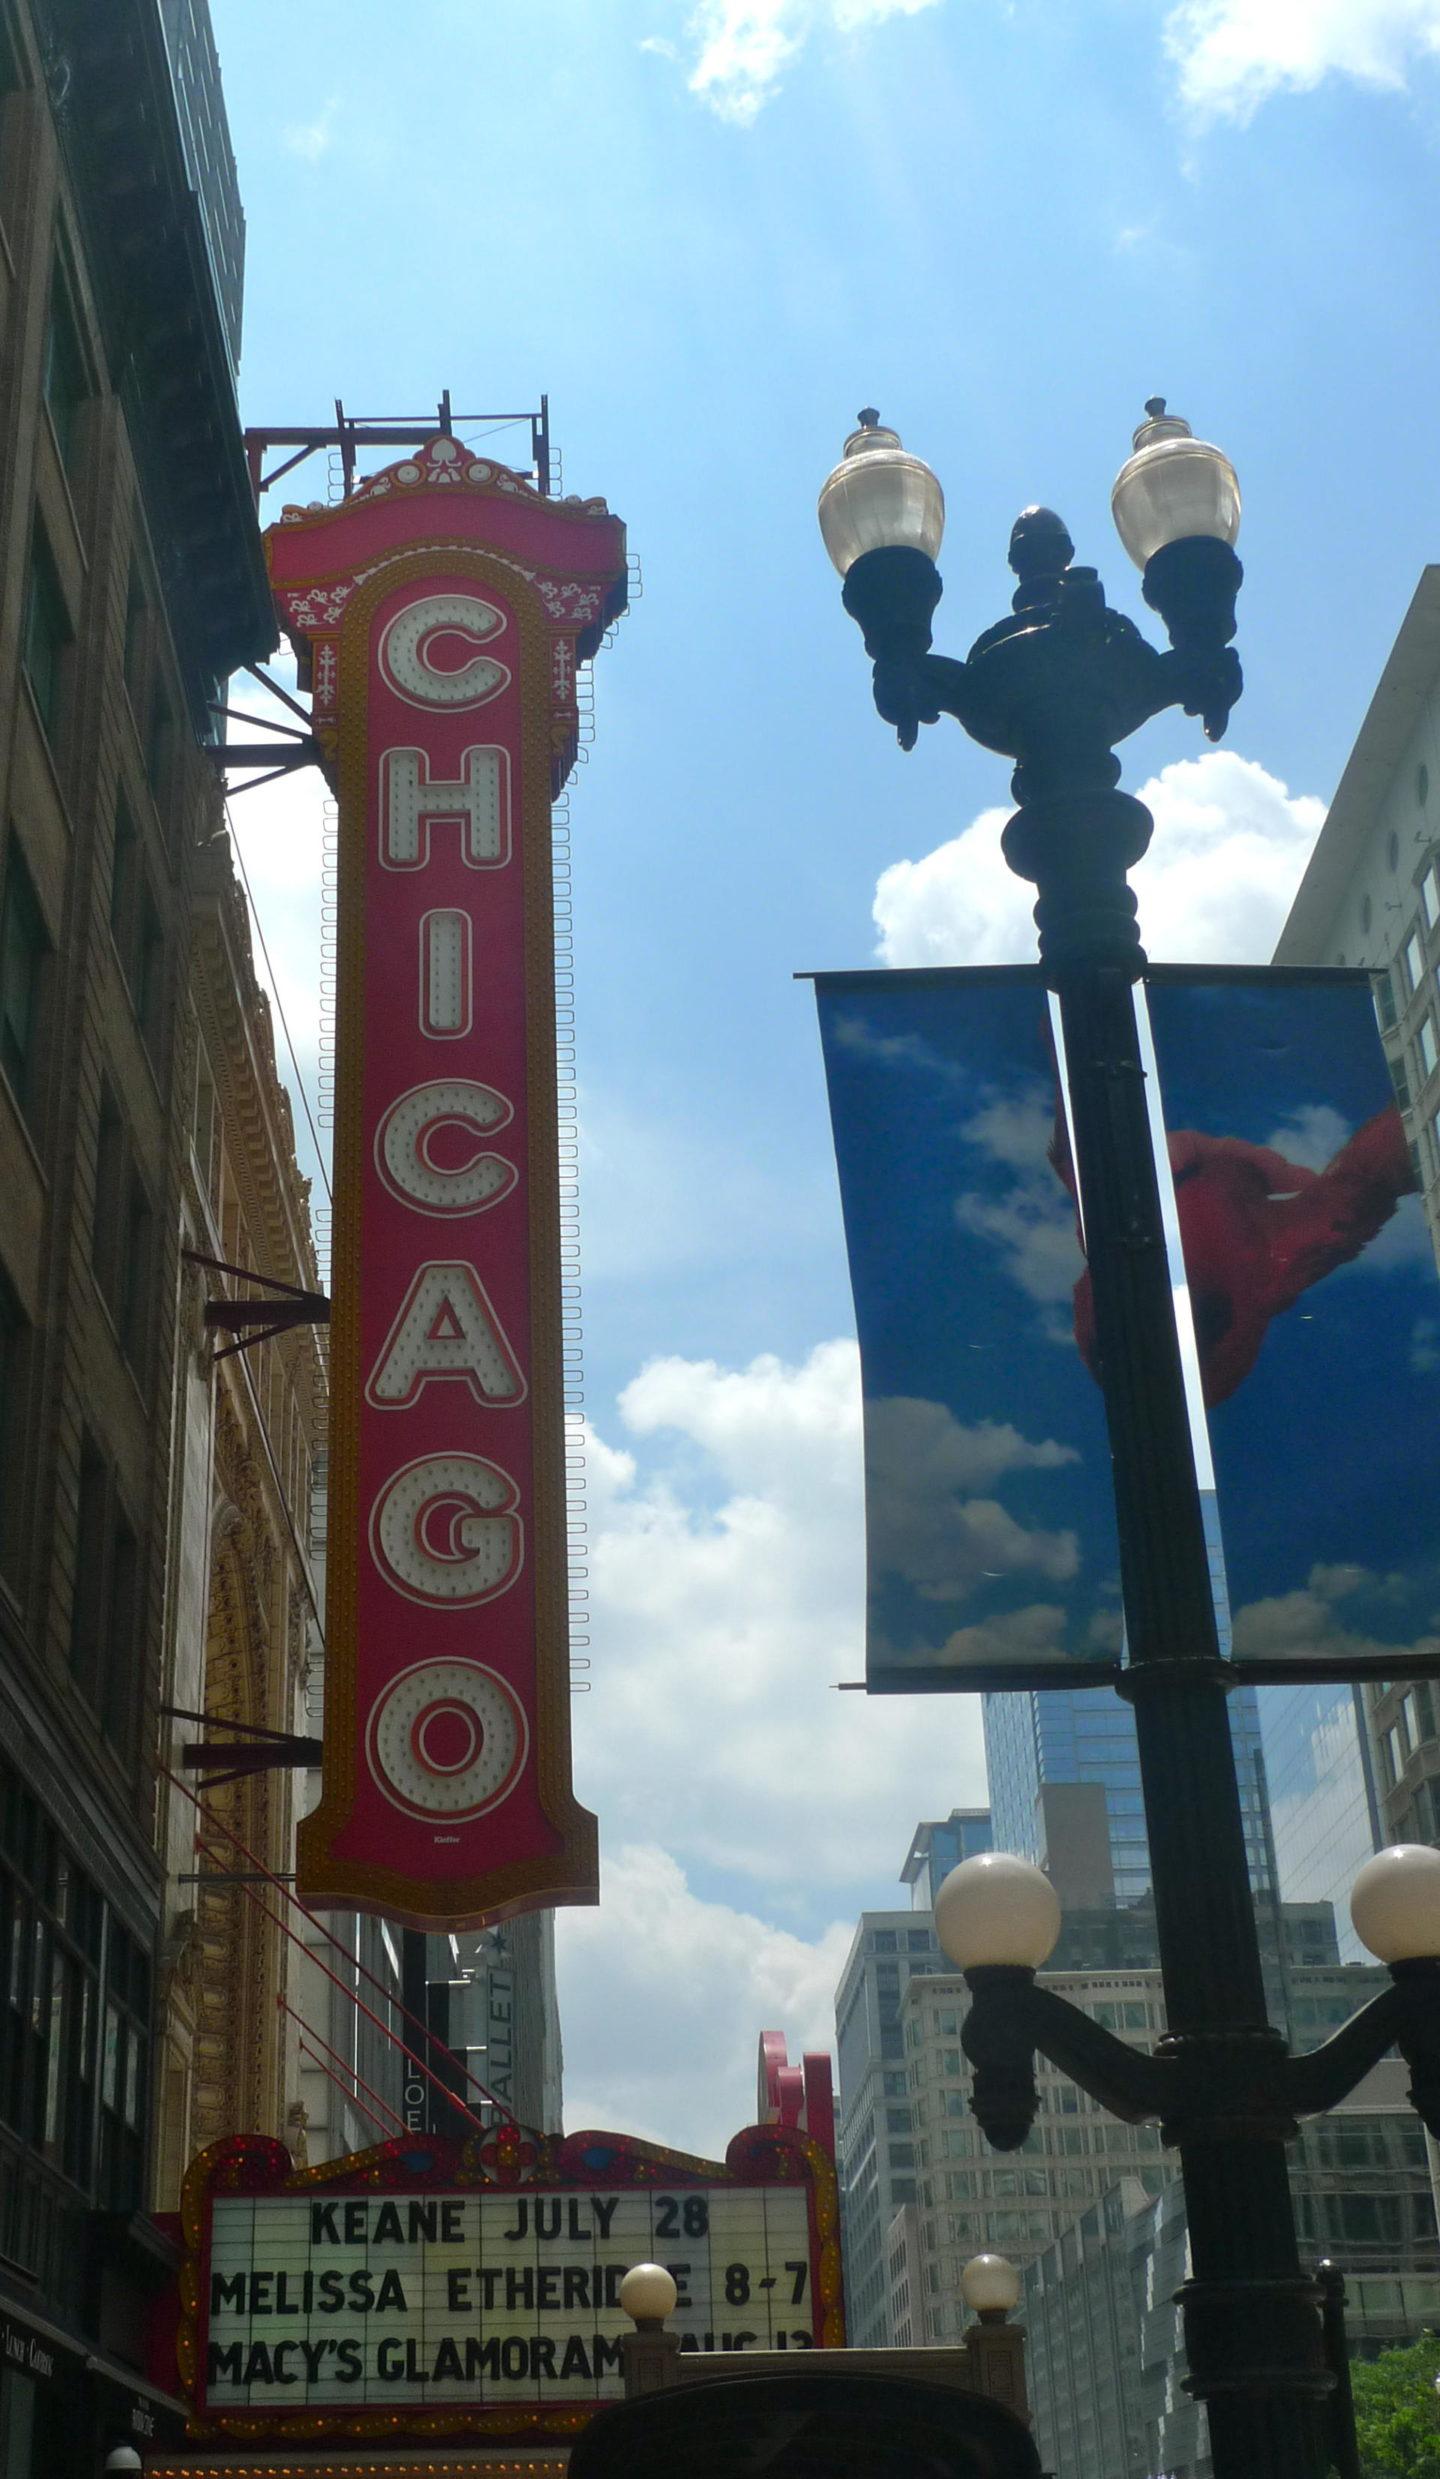 Chicago theatre show, Chicago USA